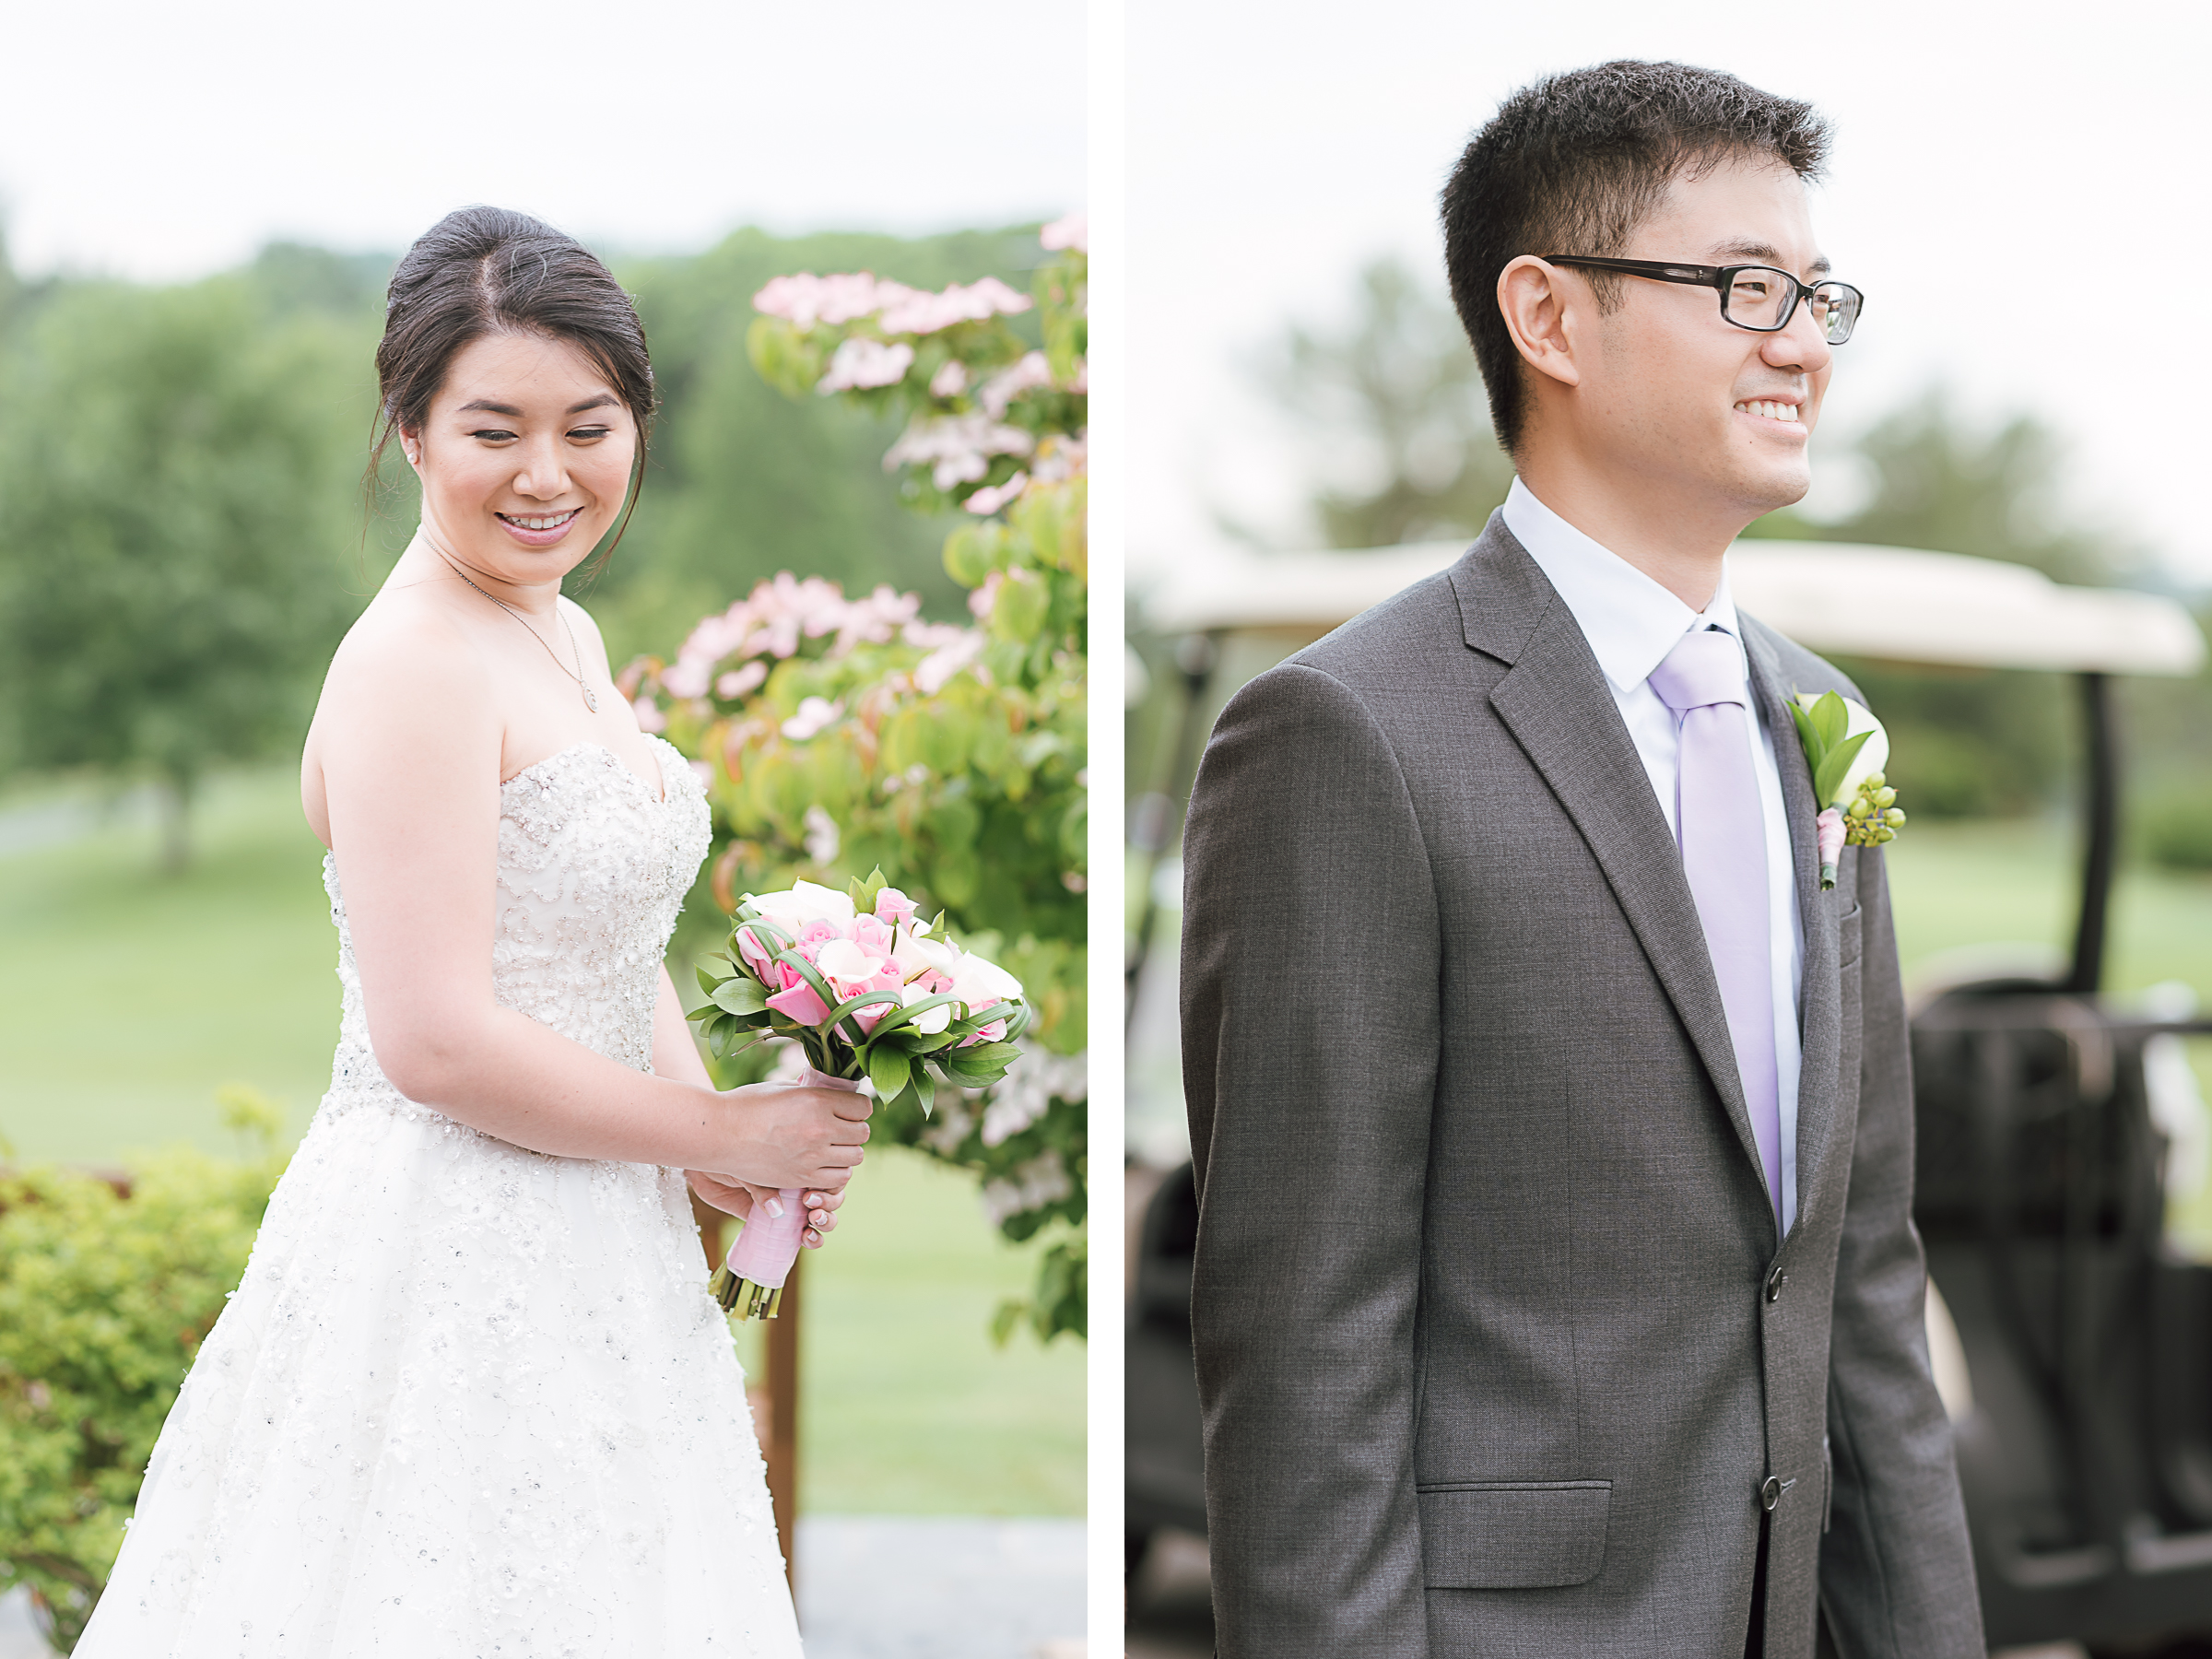 MD-Wedding-Bretton-Woods-Bride-Groom.jpg